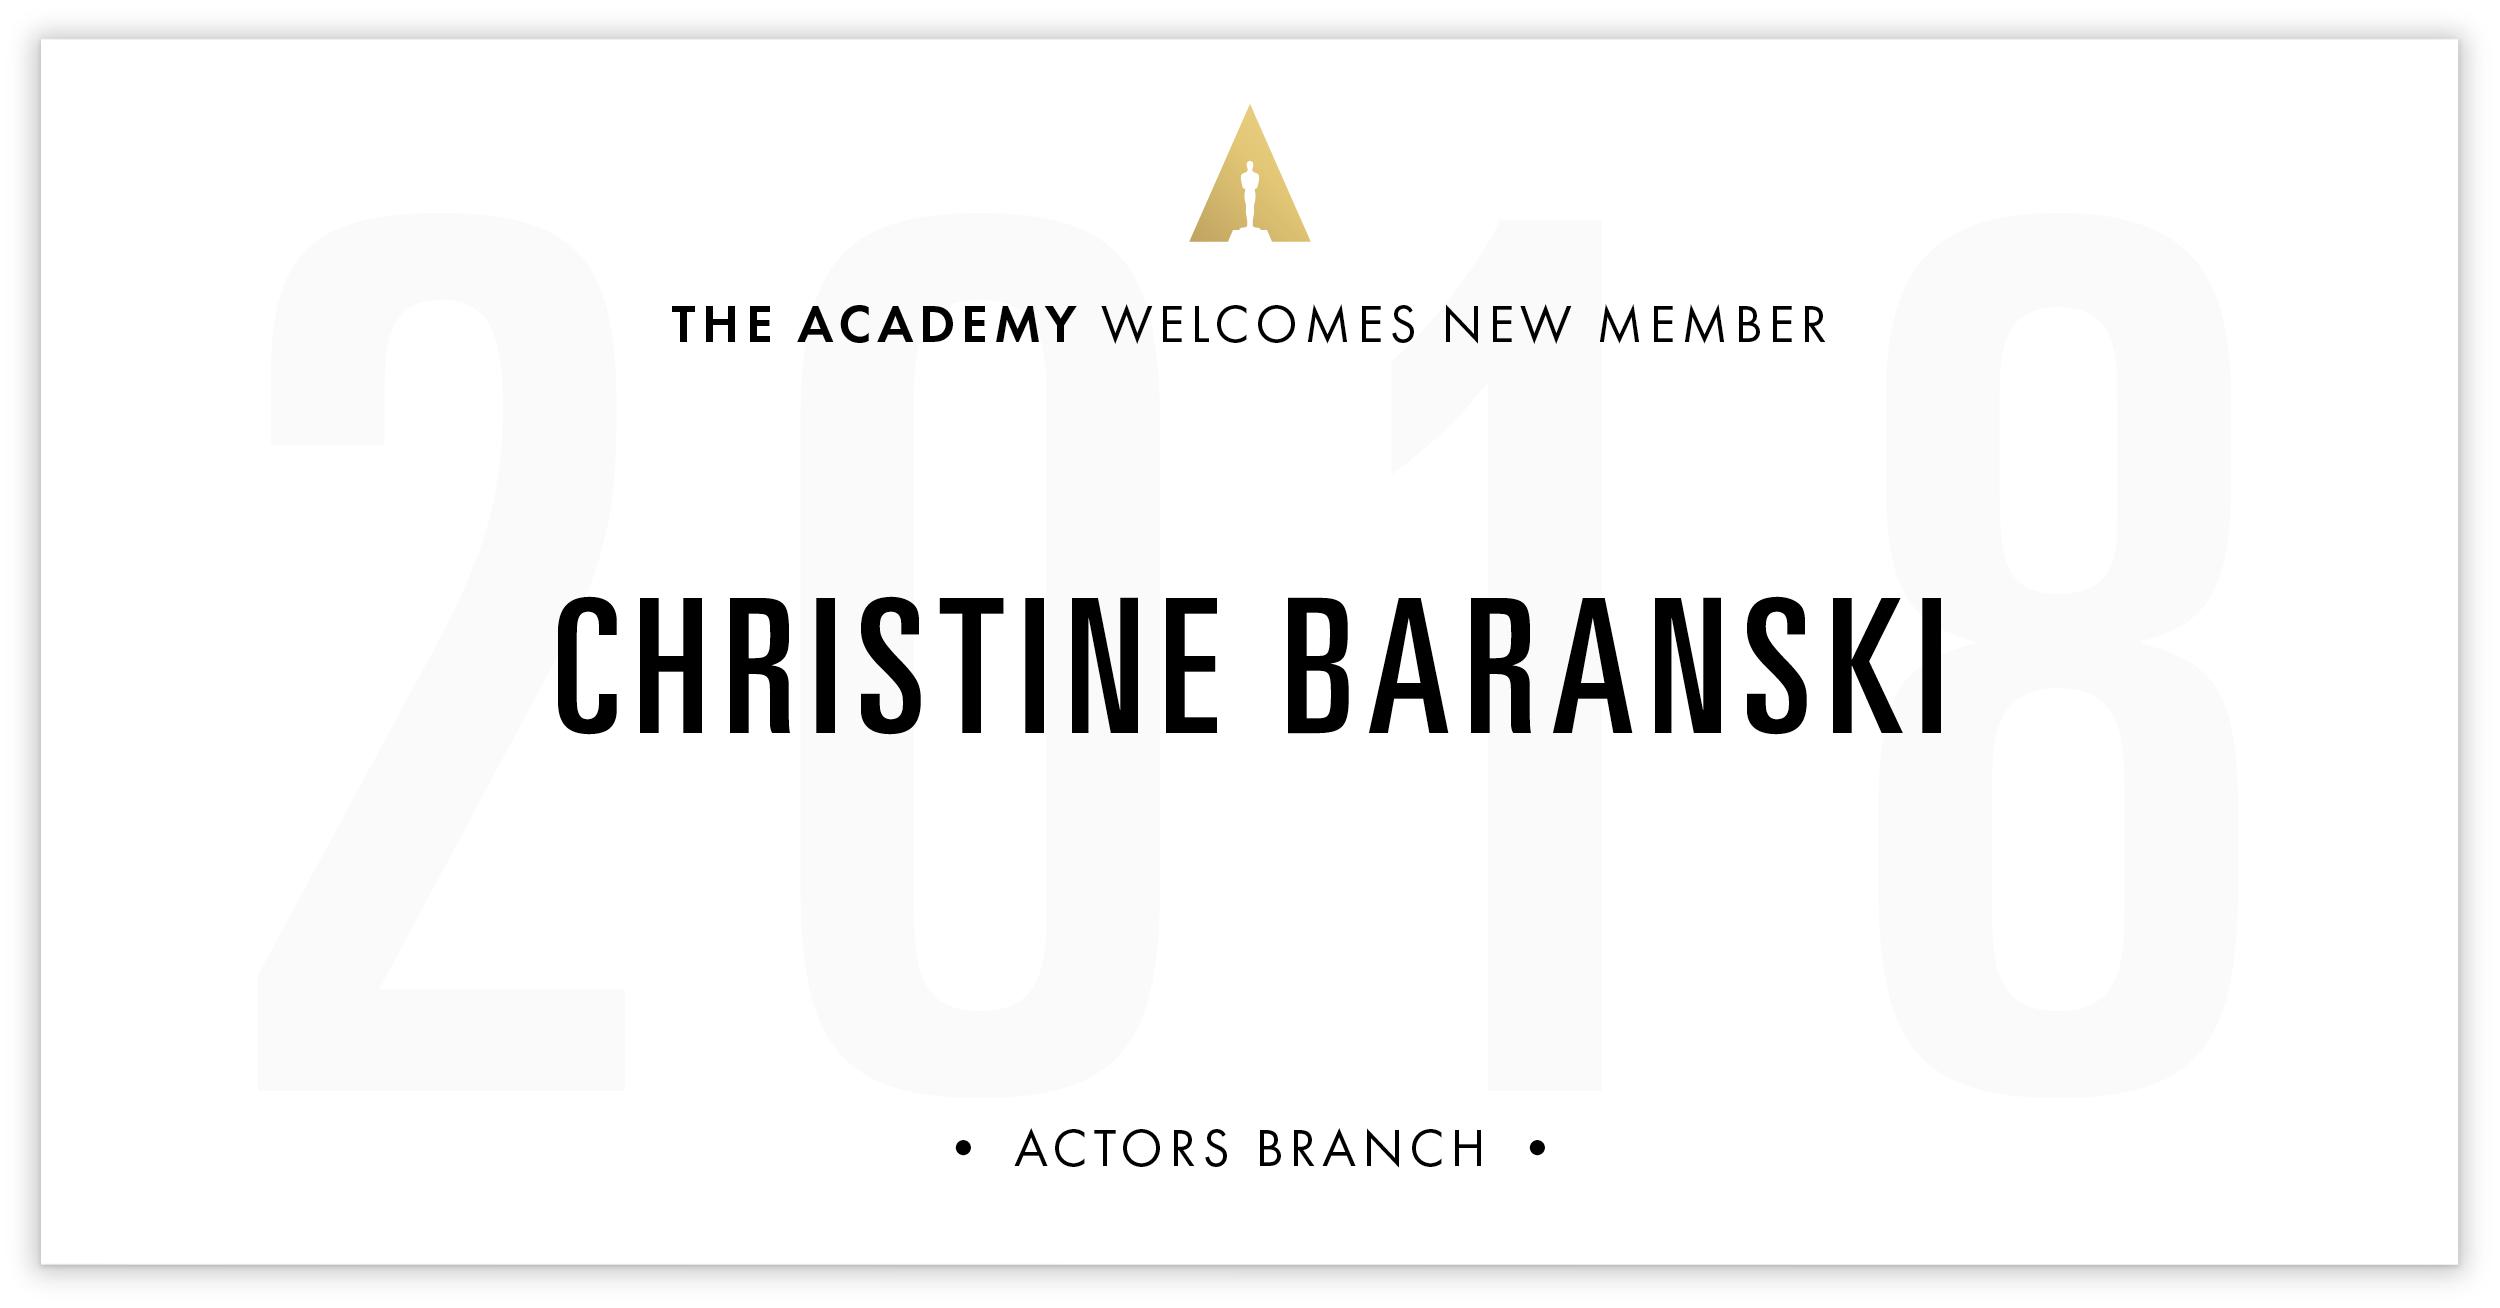 Christine Baranski is invited!